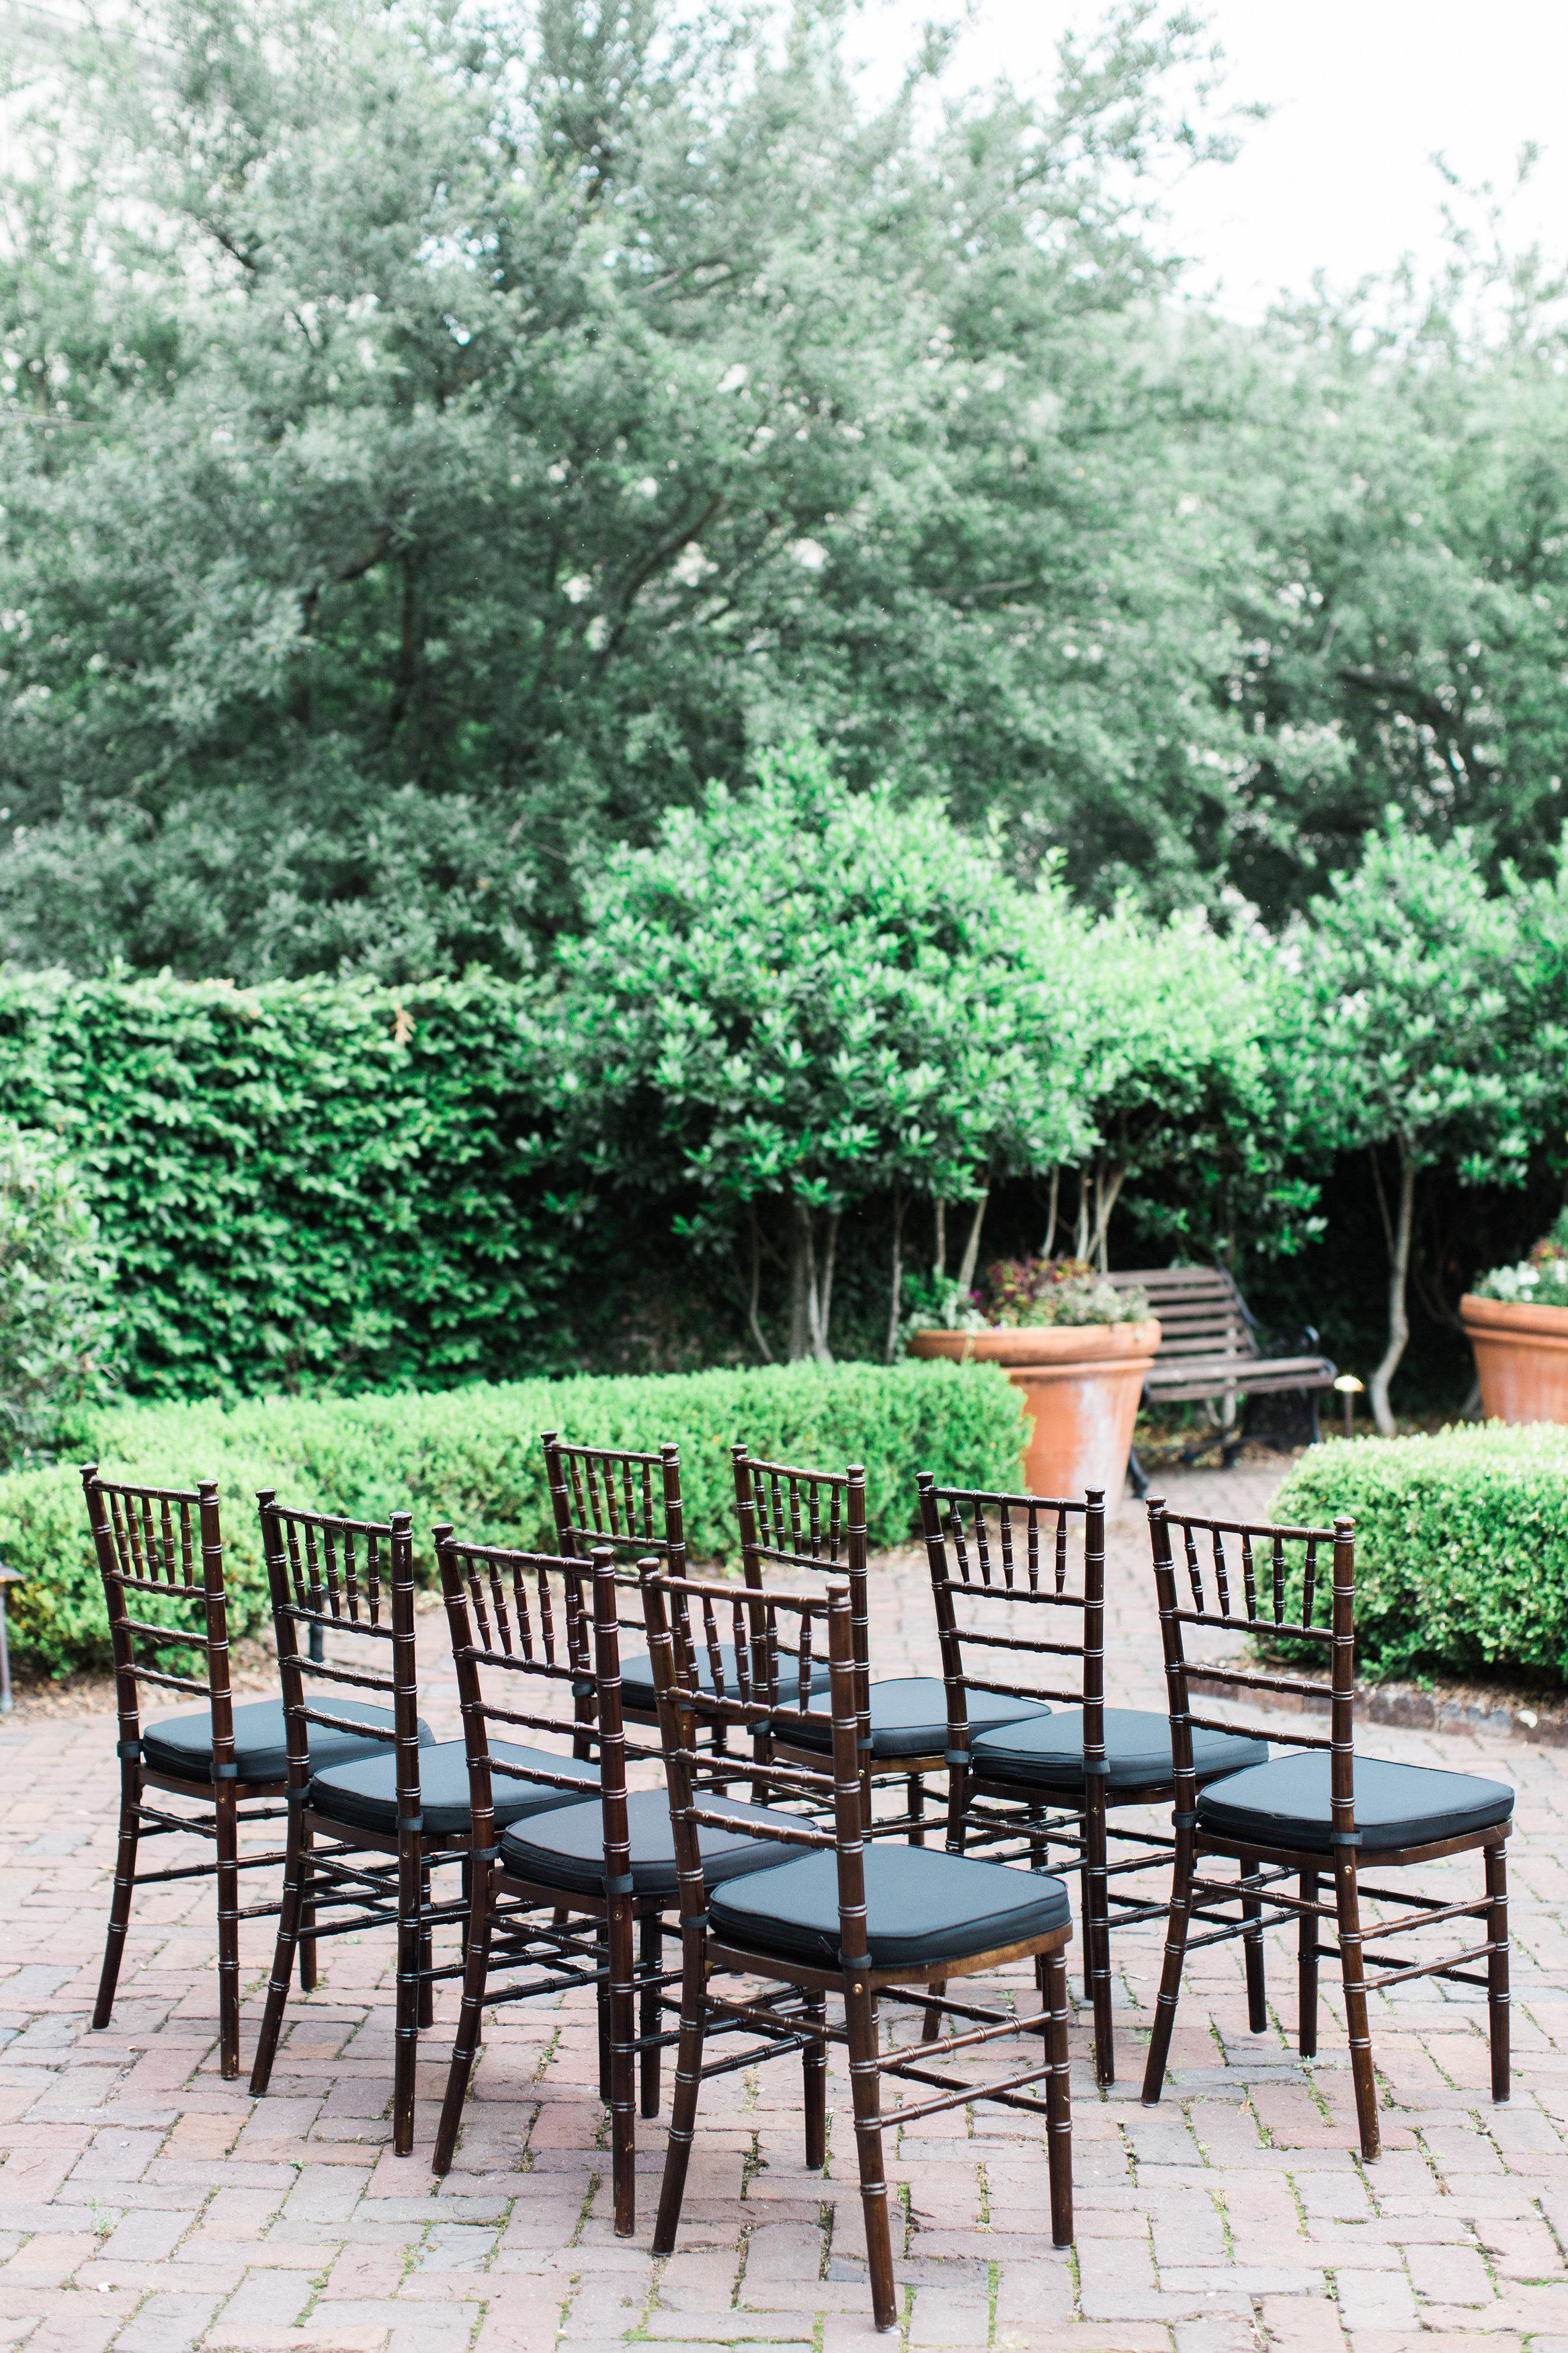 harper-fowlkes-house-wedding-ivory-and-beau-savannah-wedding-planner-savannah-event-designer-savannah-wedding-florist-historic-home-wedding-in-savannah-georgia-destination-wedding-planner-2.jpg